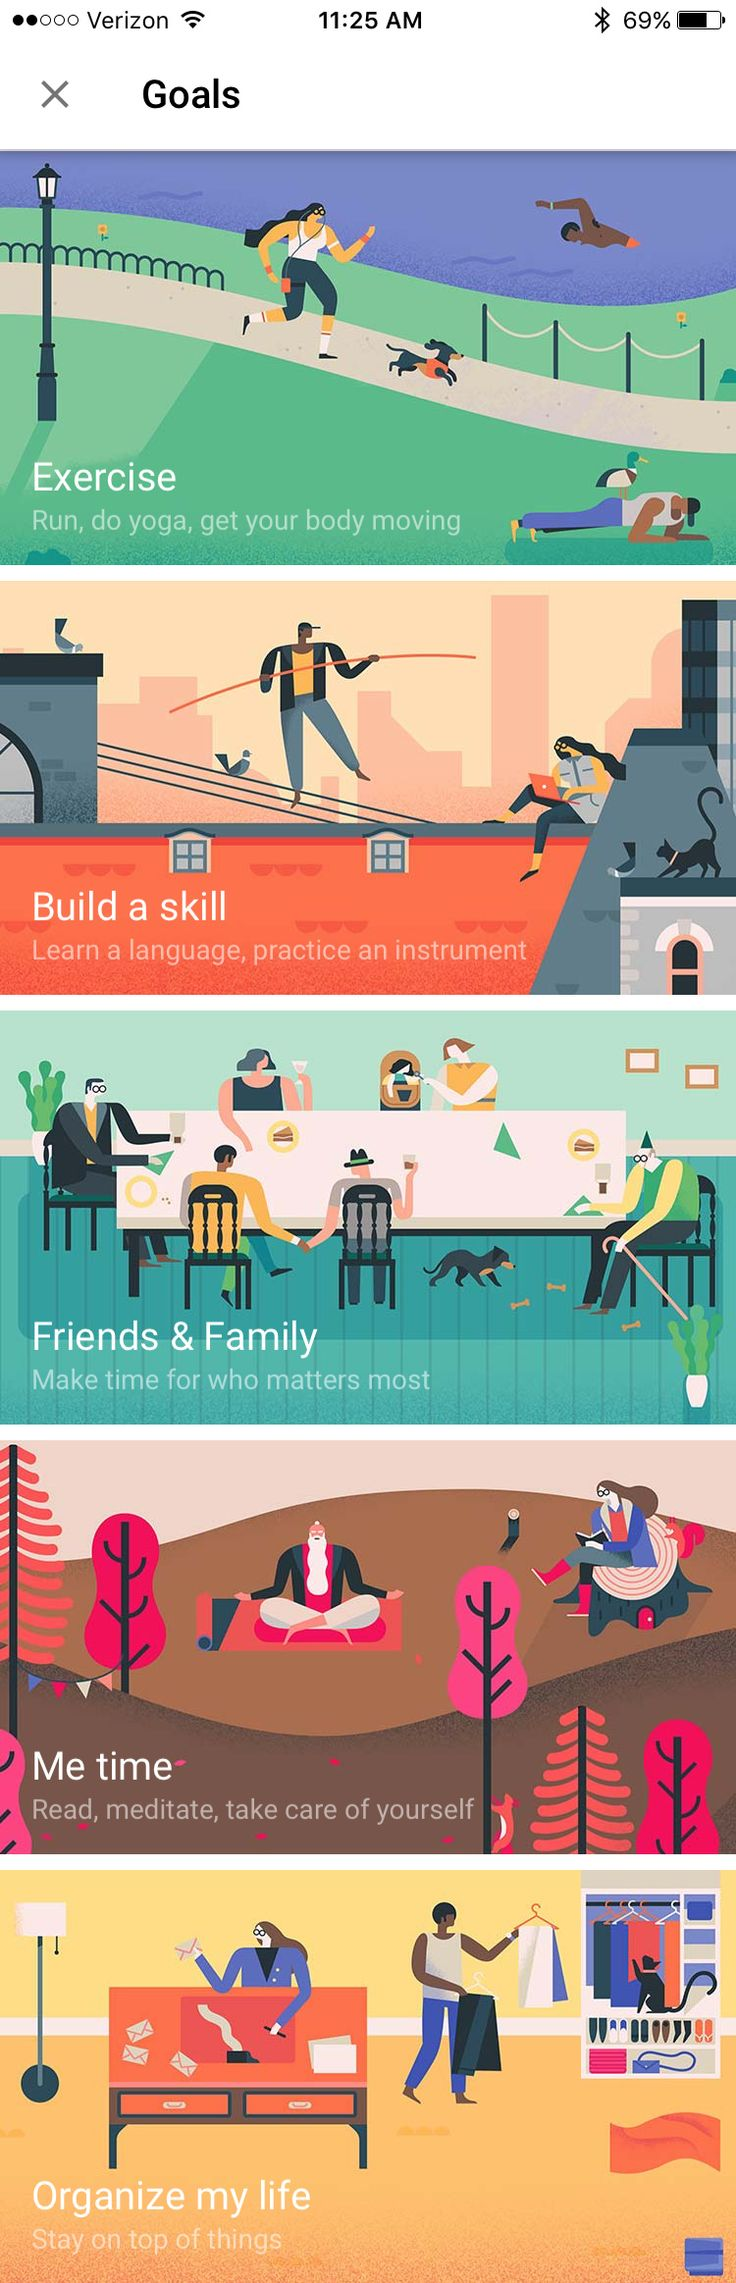 Google Calendar Goals Illustrations — Owen Davey                                                                                                                                                                                 More